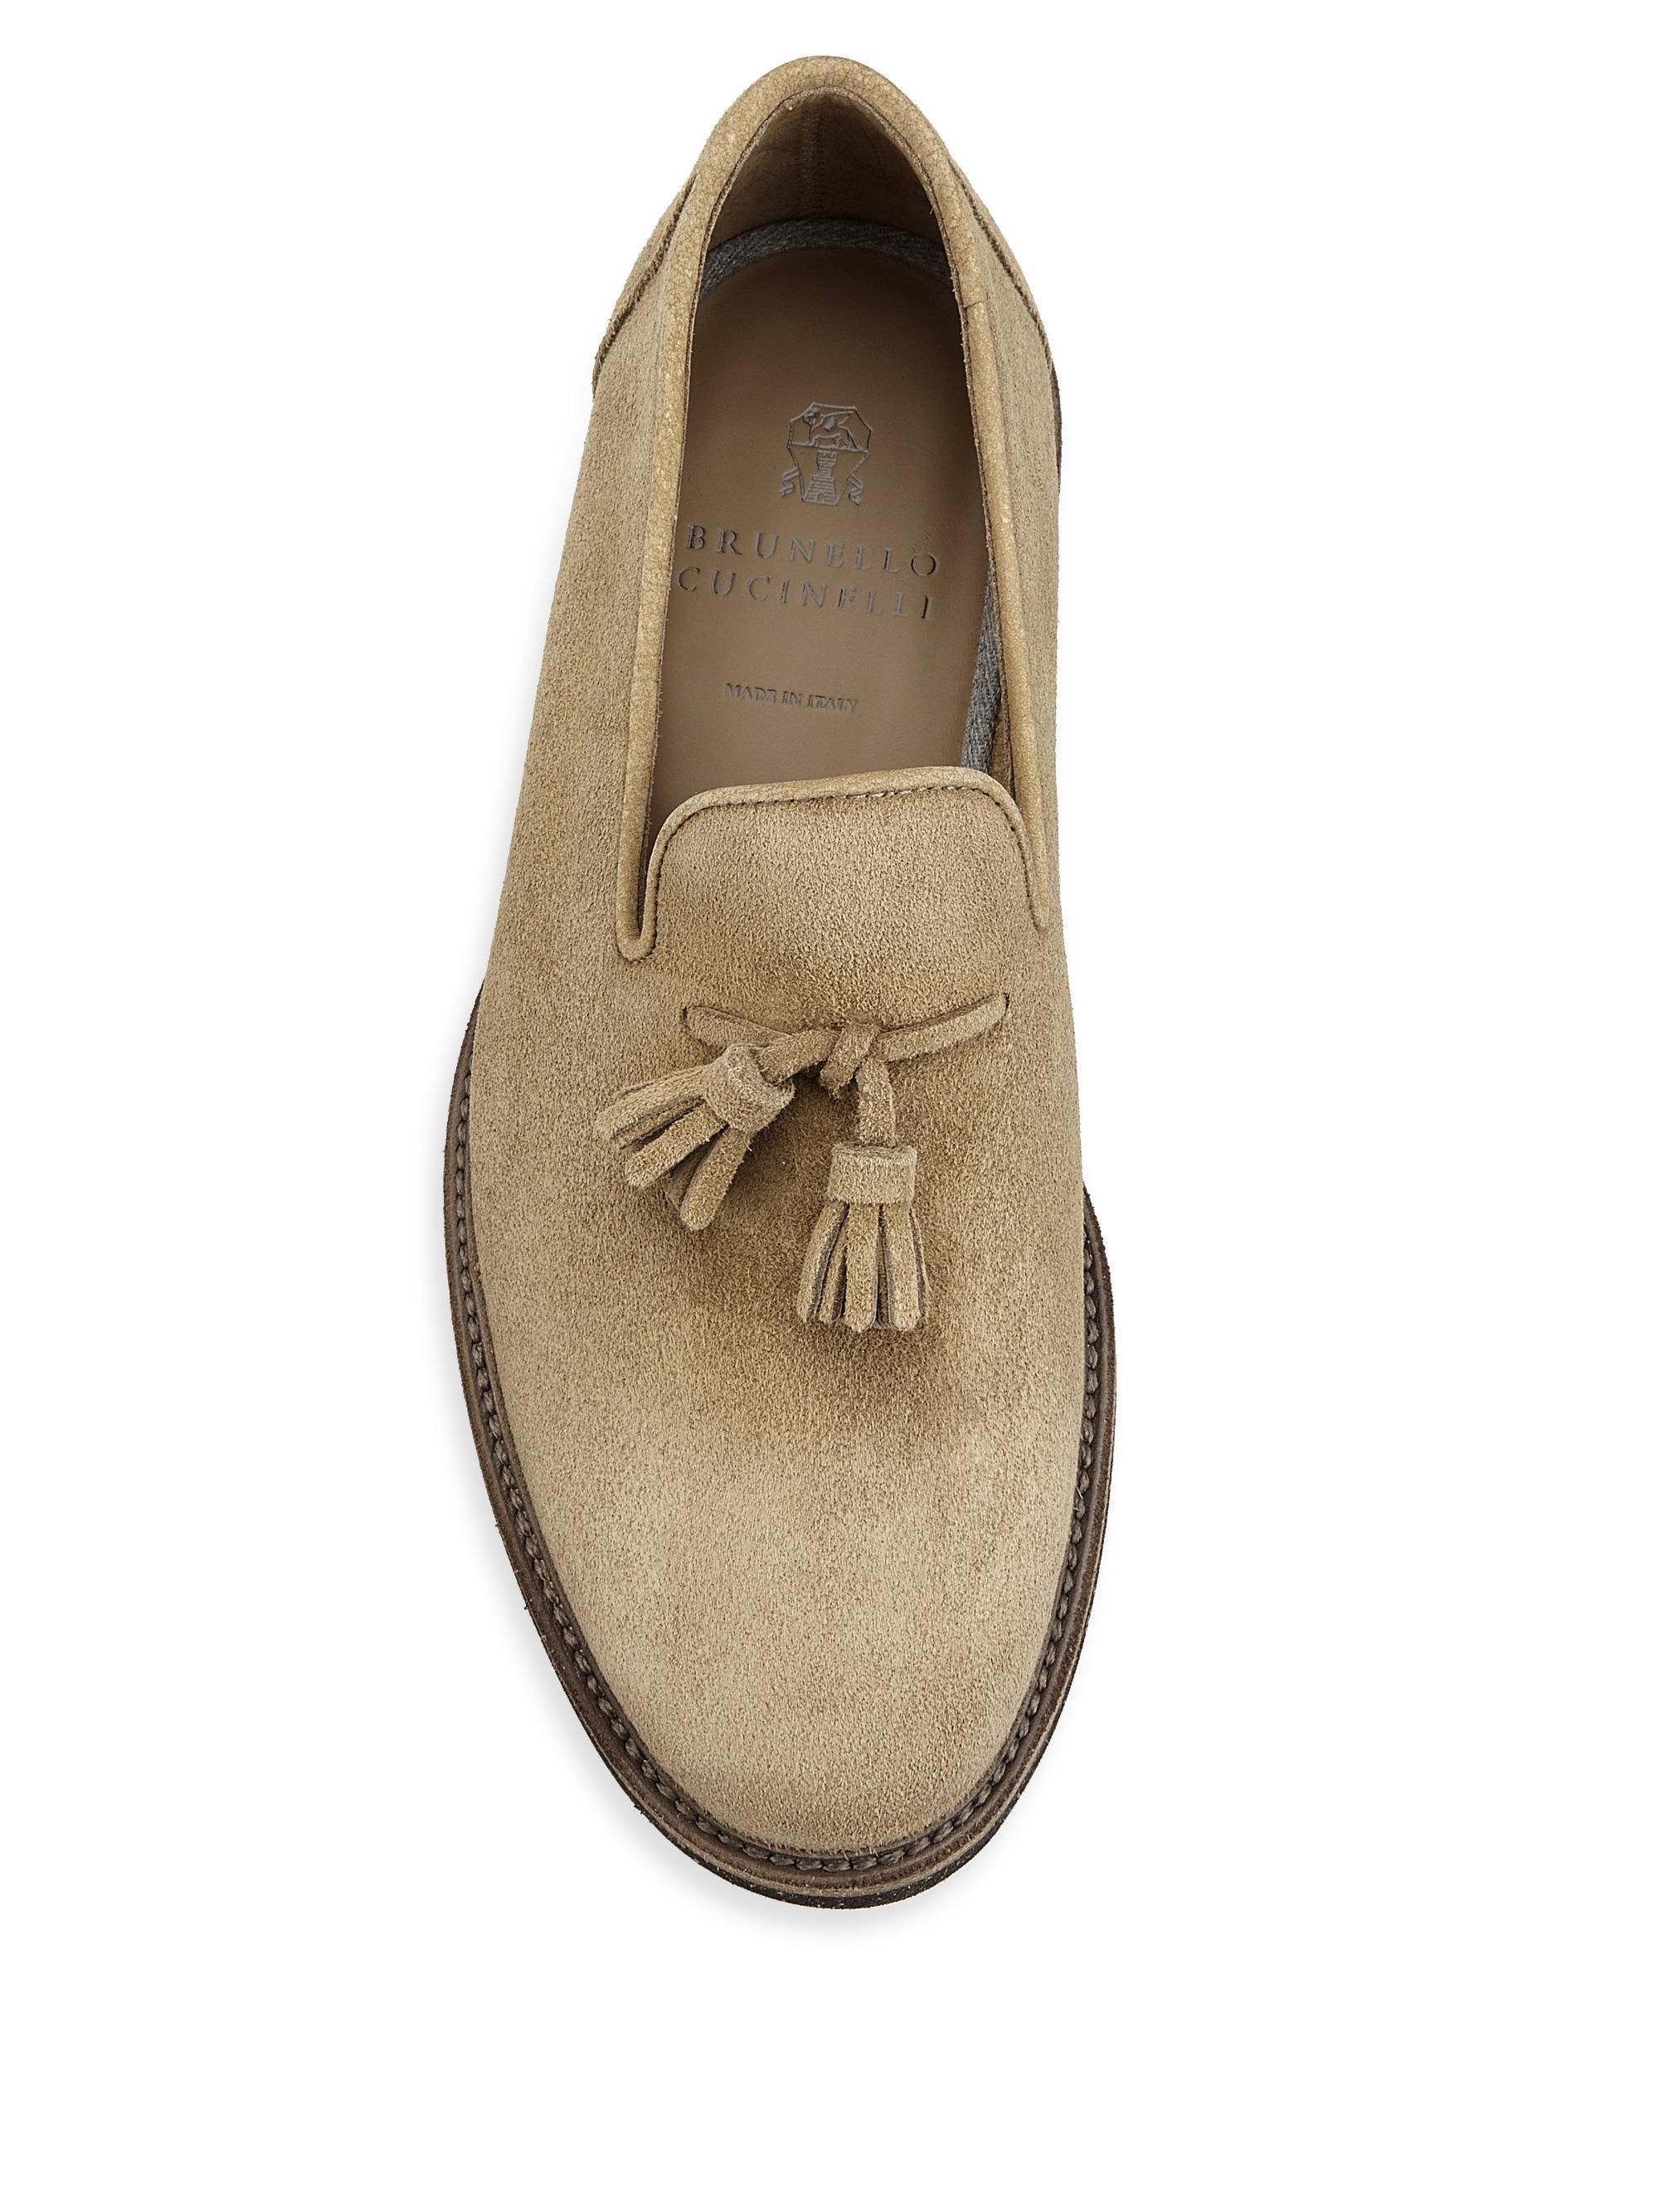 brand new 97017 19e89 brunello-cucinelli-beige-Tassel-Suede-Loafers.jpeg